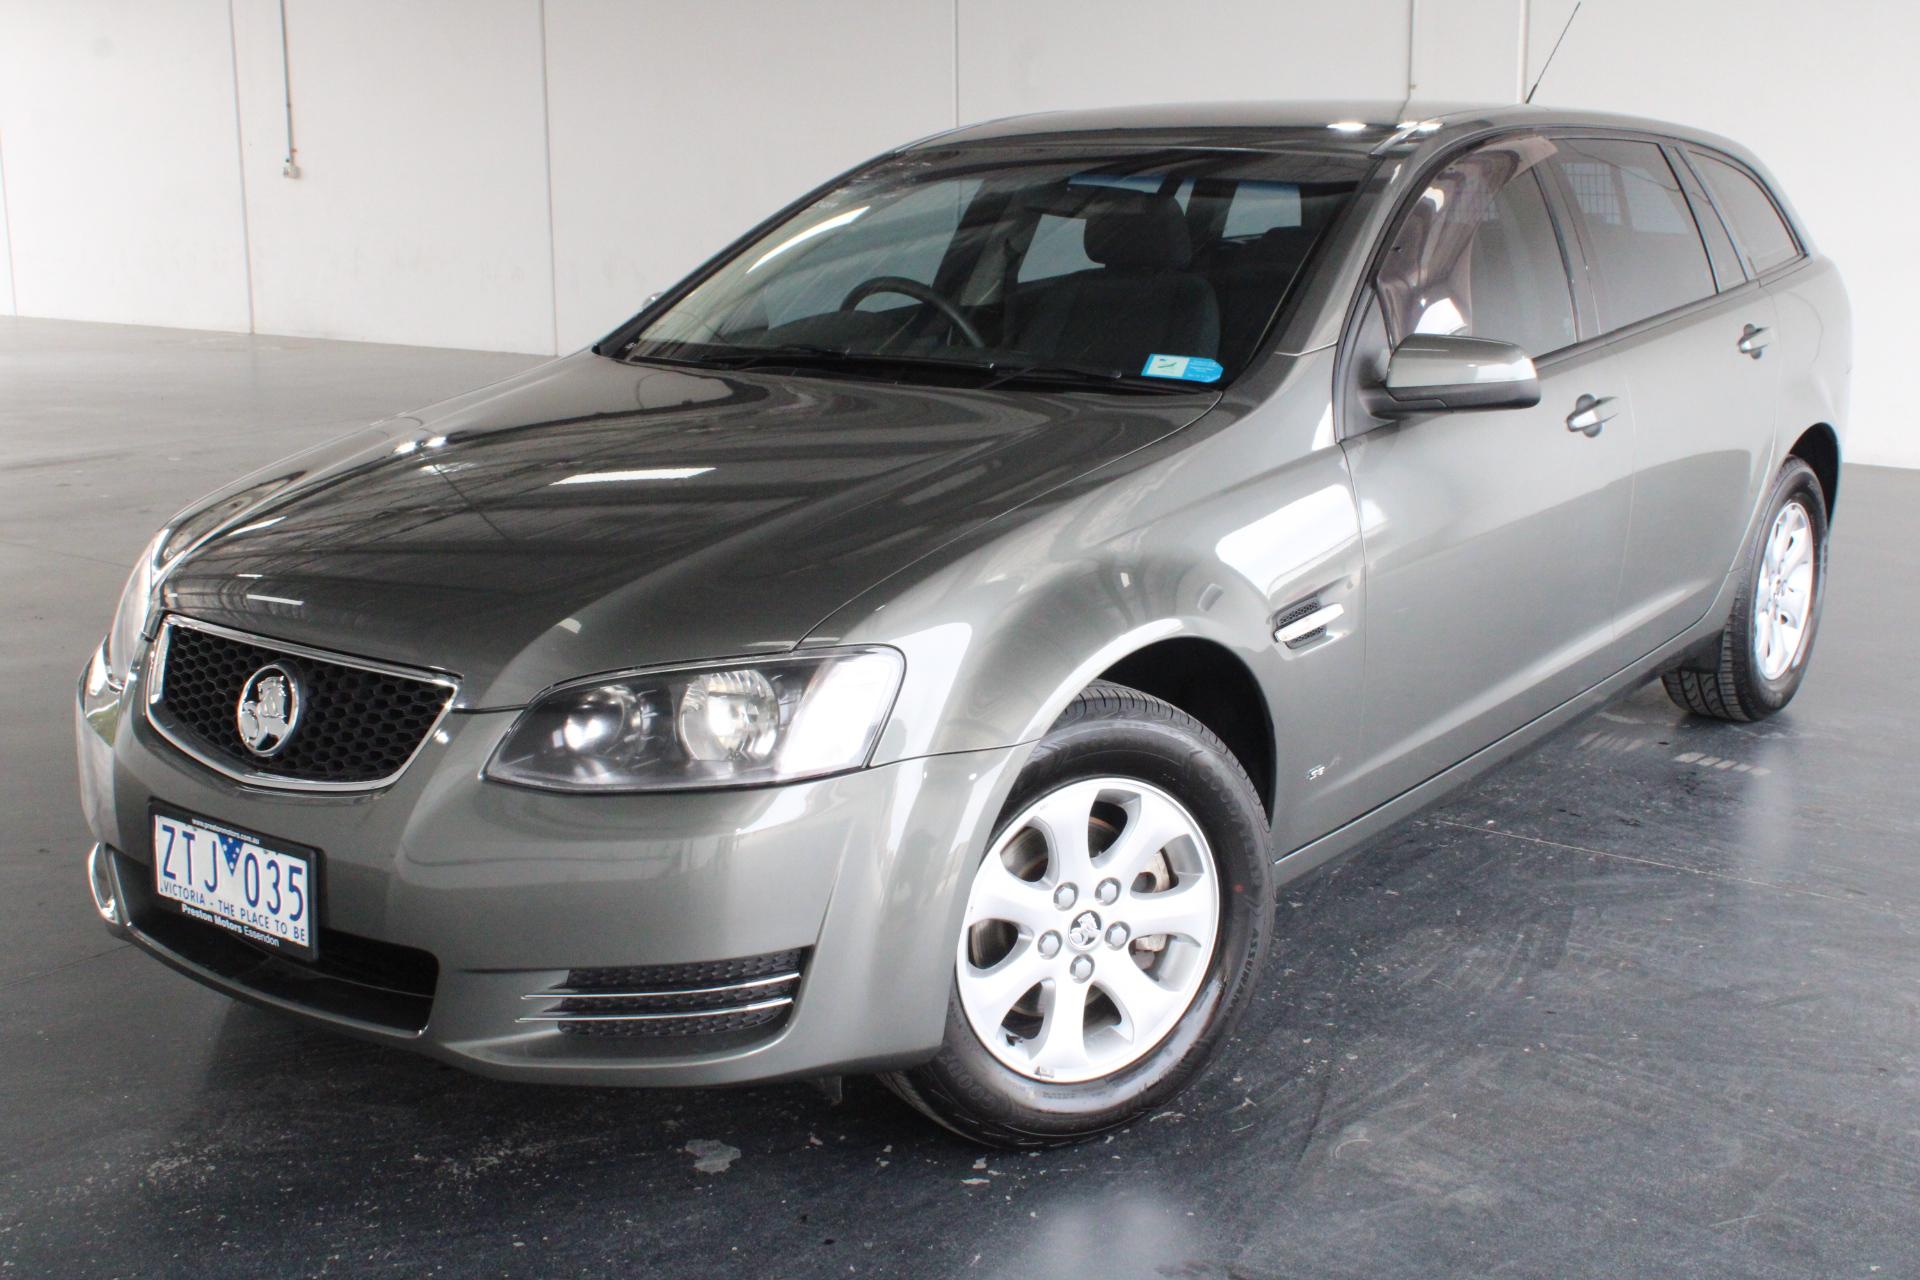 2013 Holden Sportwagon Z-SERIES VE II Automatic Wagon